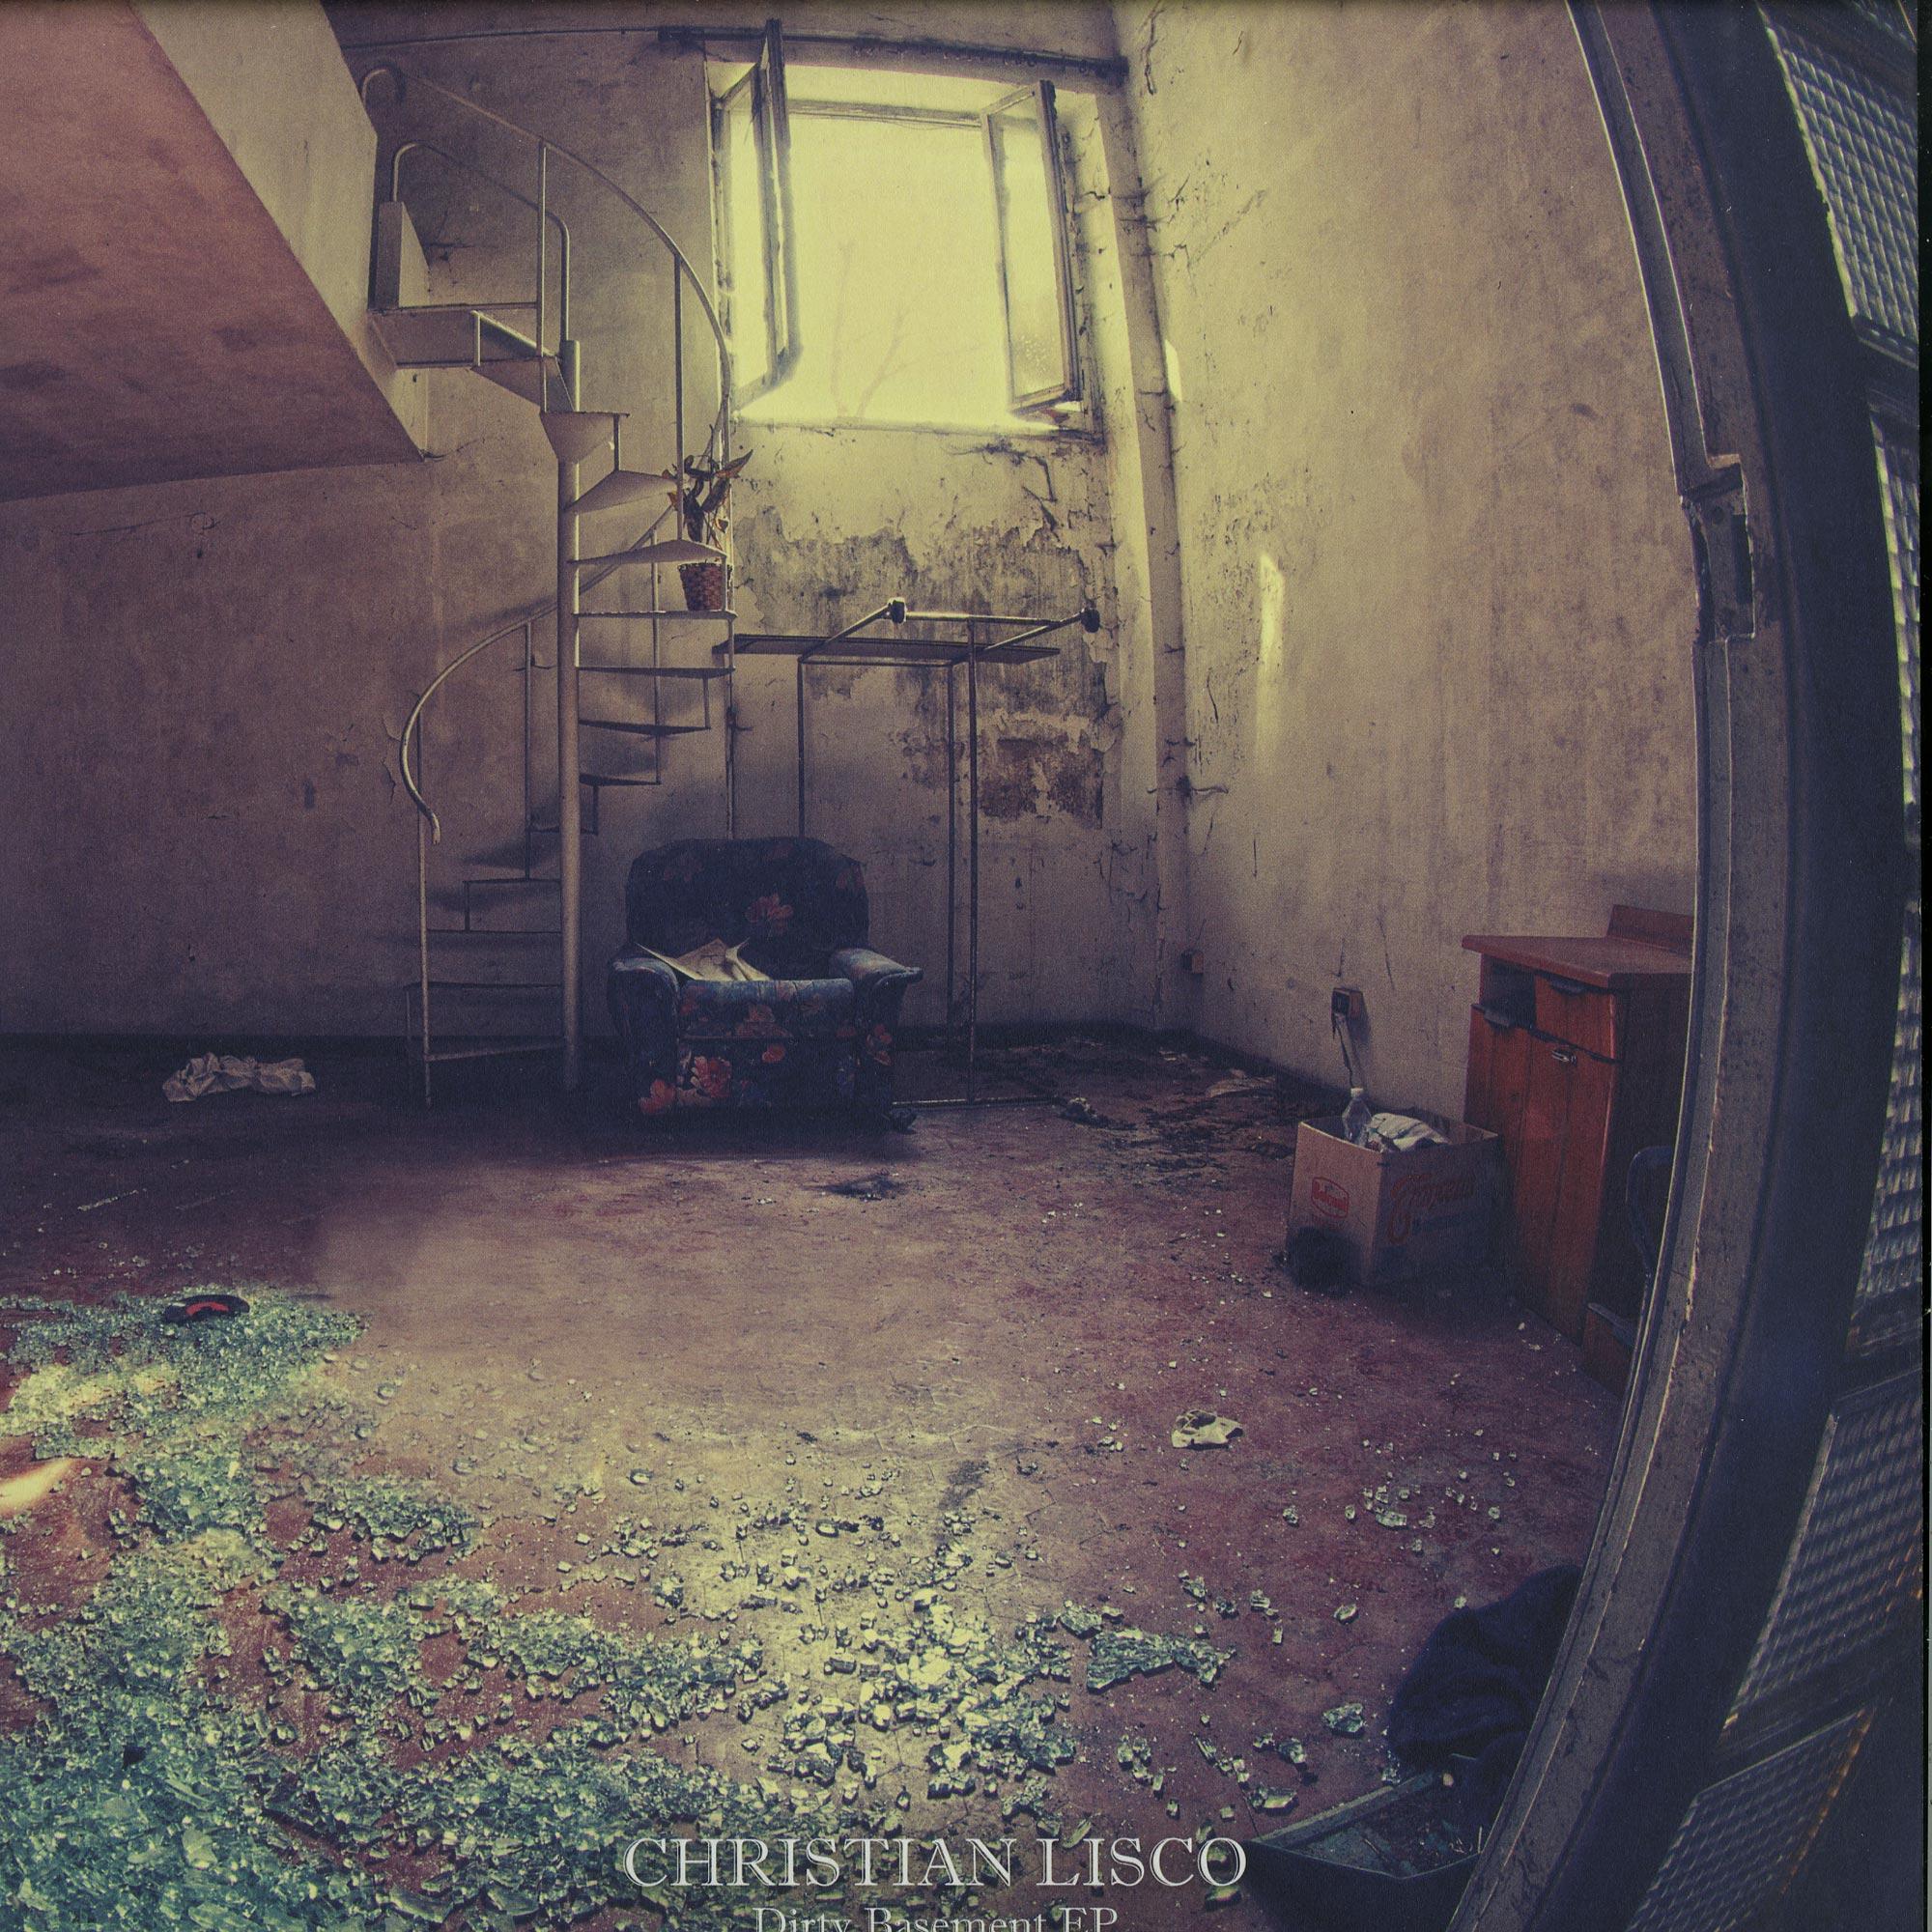 Christian Lisco - DIRTY BASEMENT EP